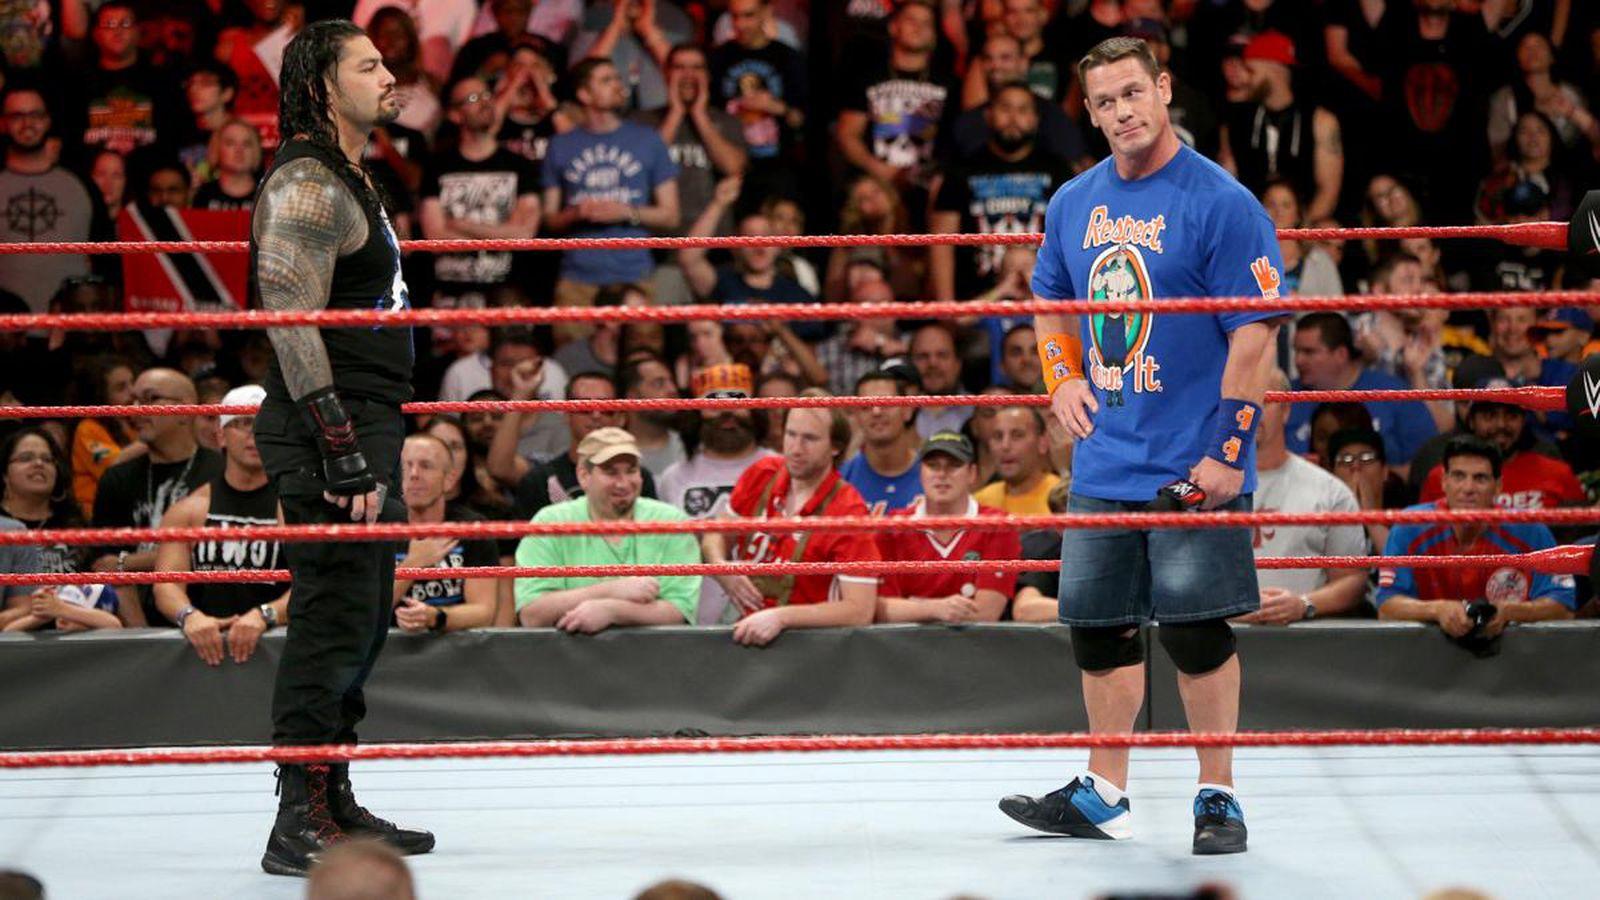 Kenzo Suzuki Vs John Cena